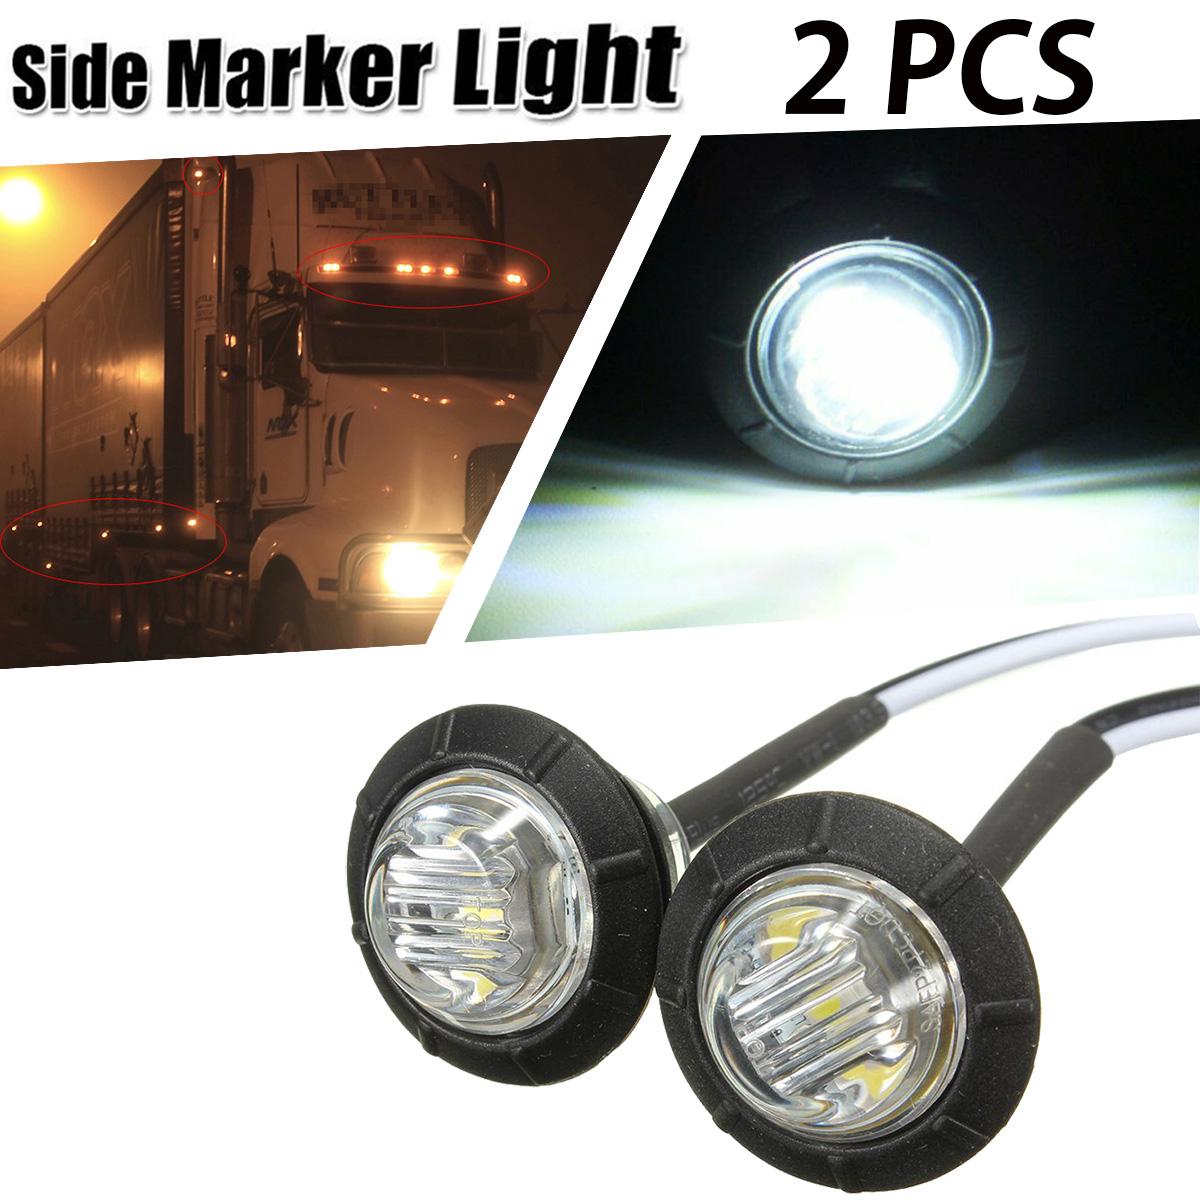 partsam 2pcs 3//4 Miniature Side Marker Clearance LED Light Round White Waterproof